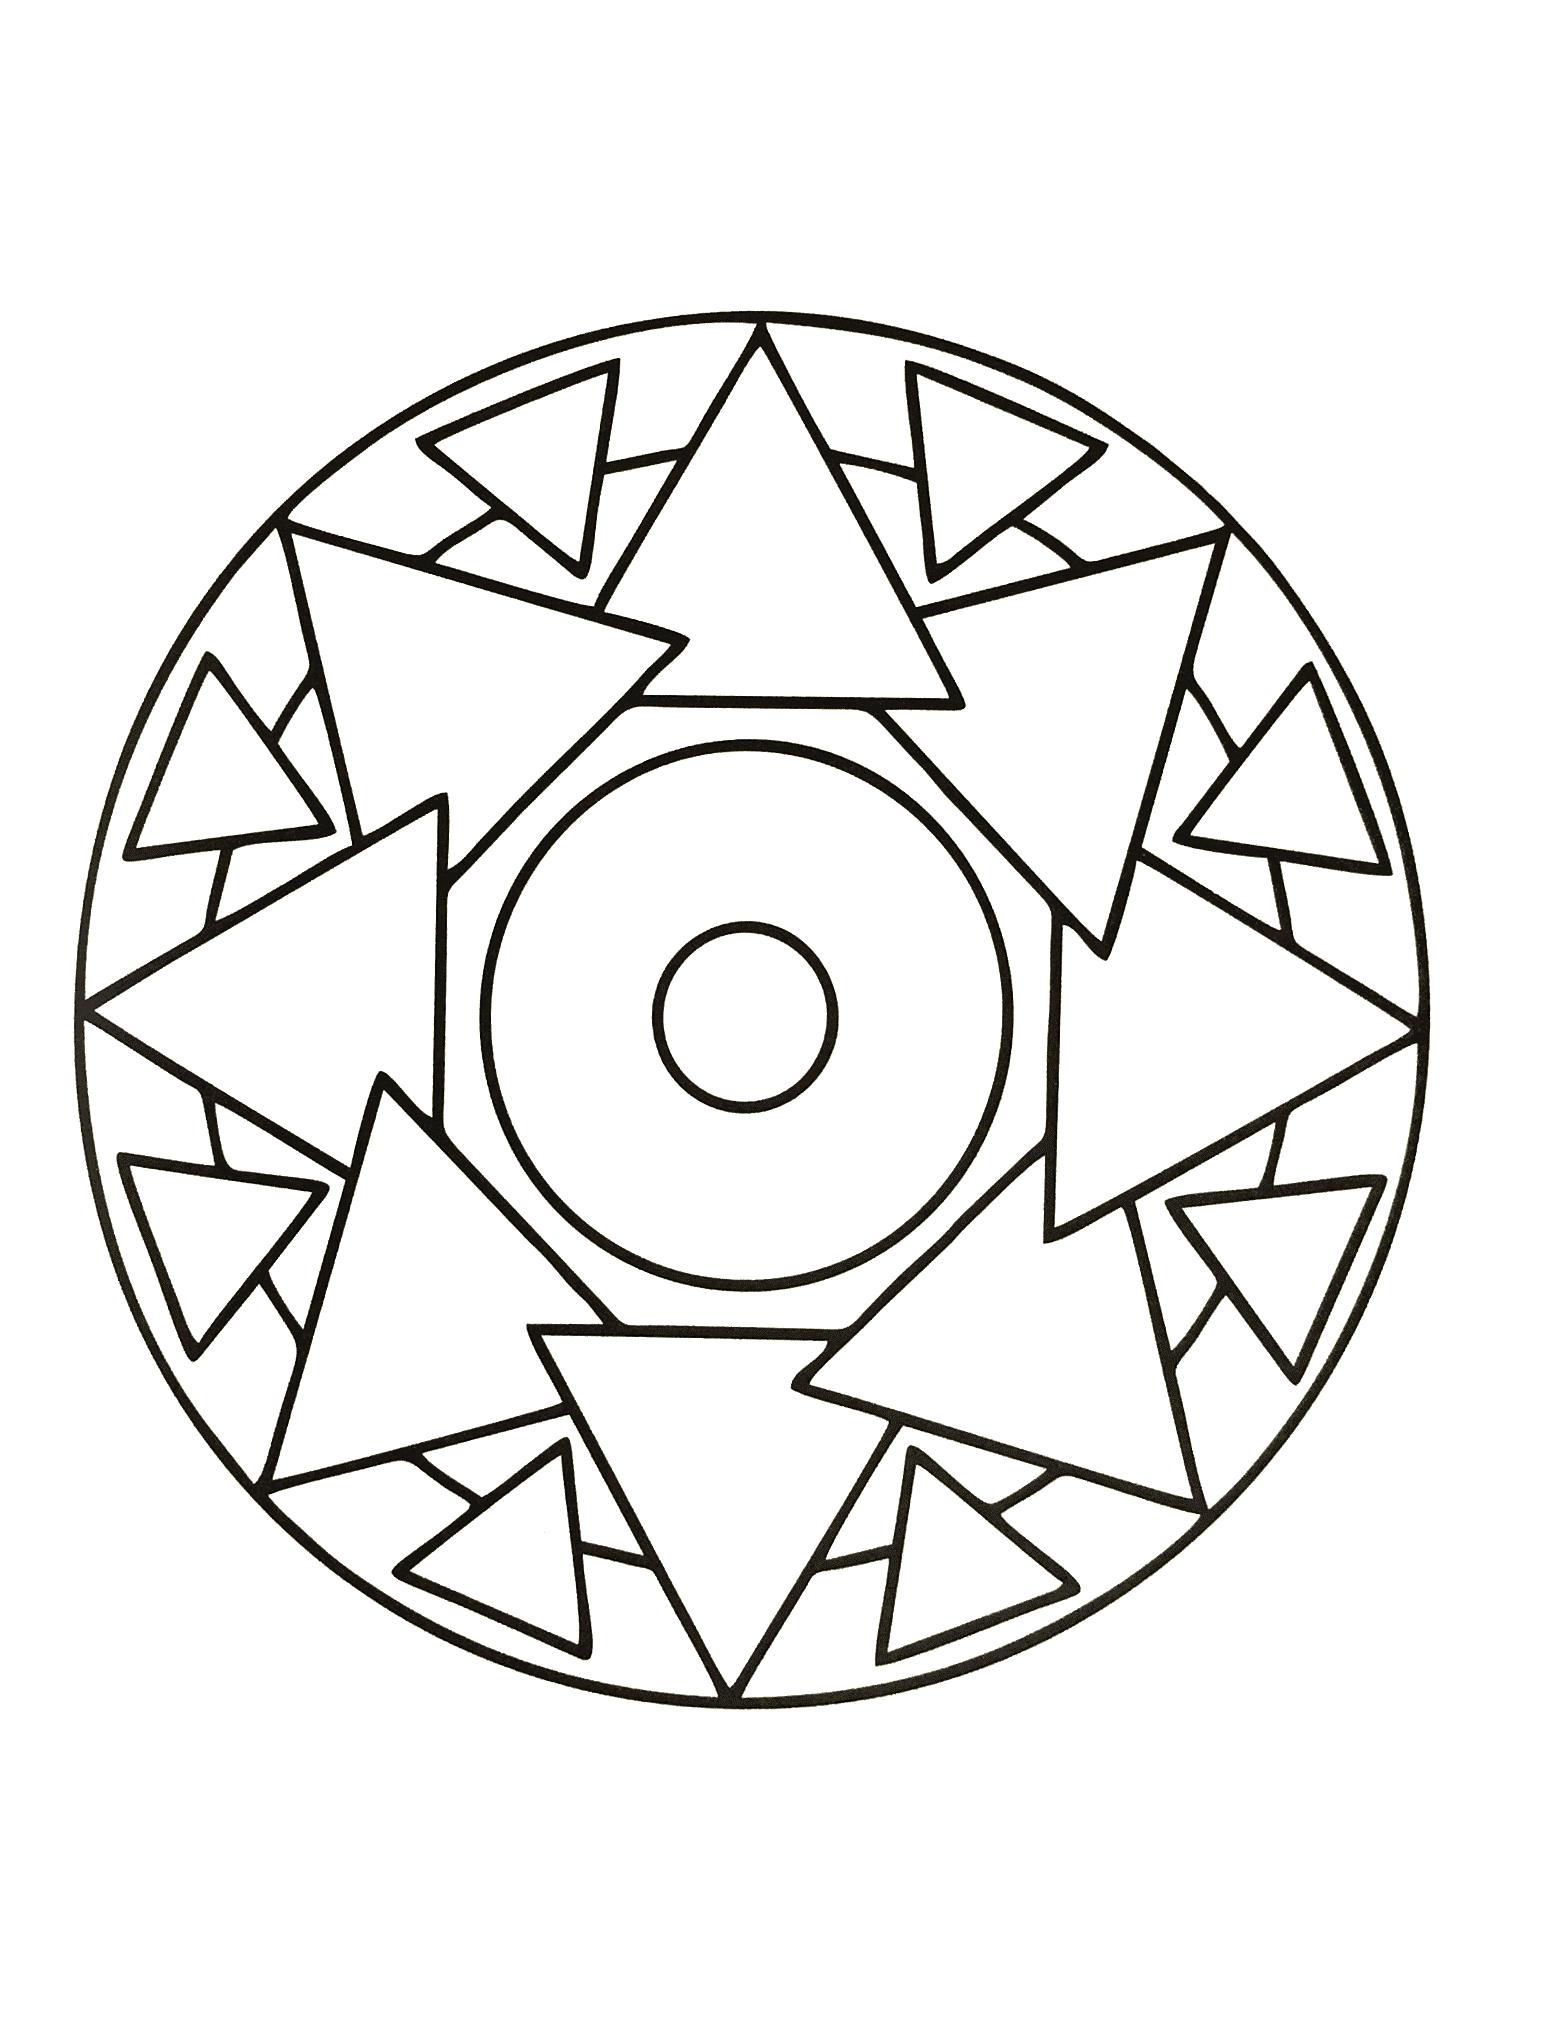 Simple mandala 65 - Mandalas Coloring pages for kids to ...